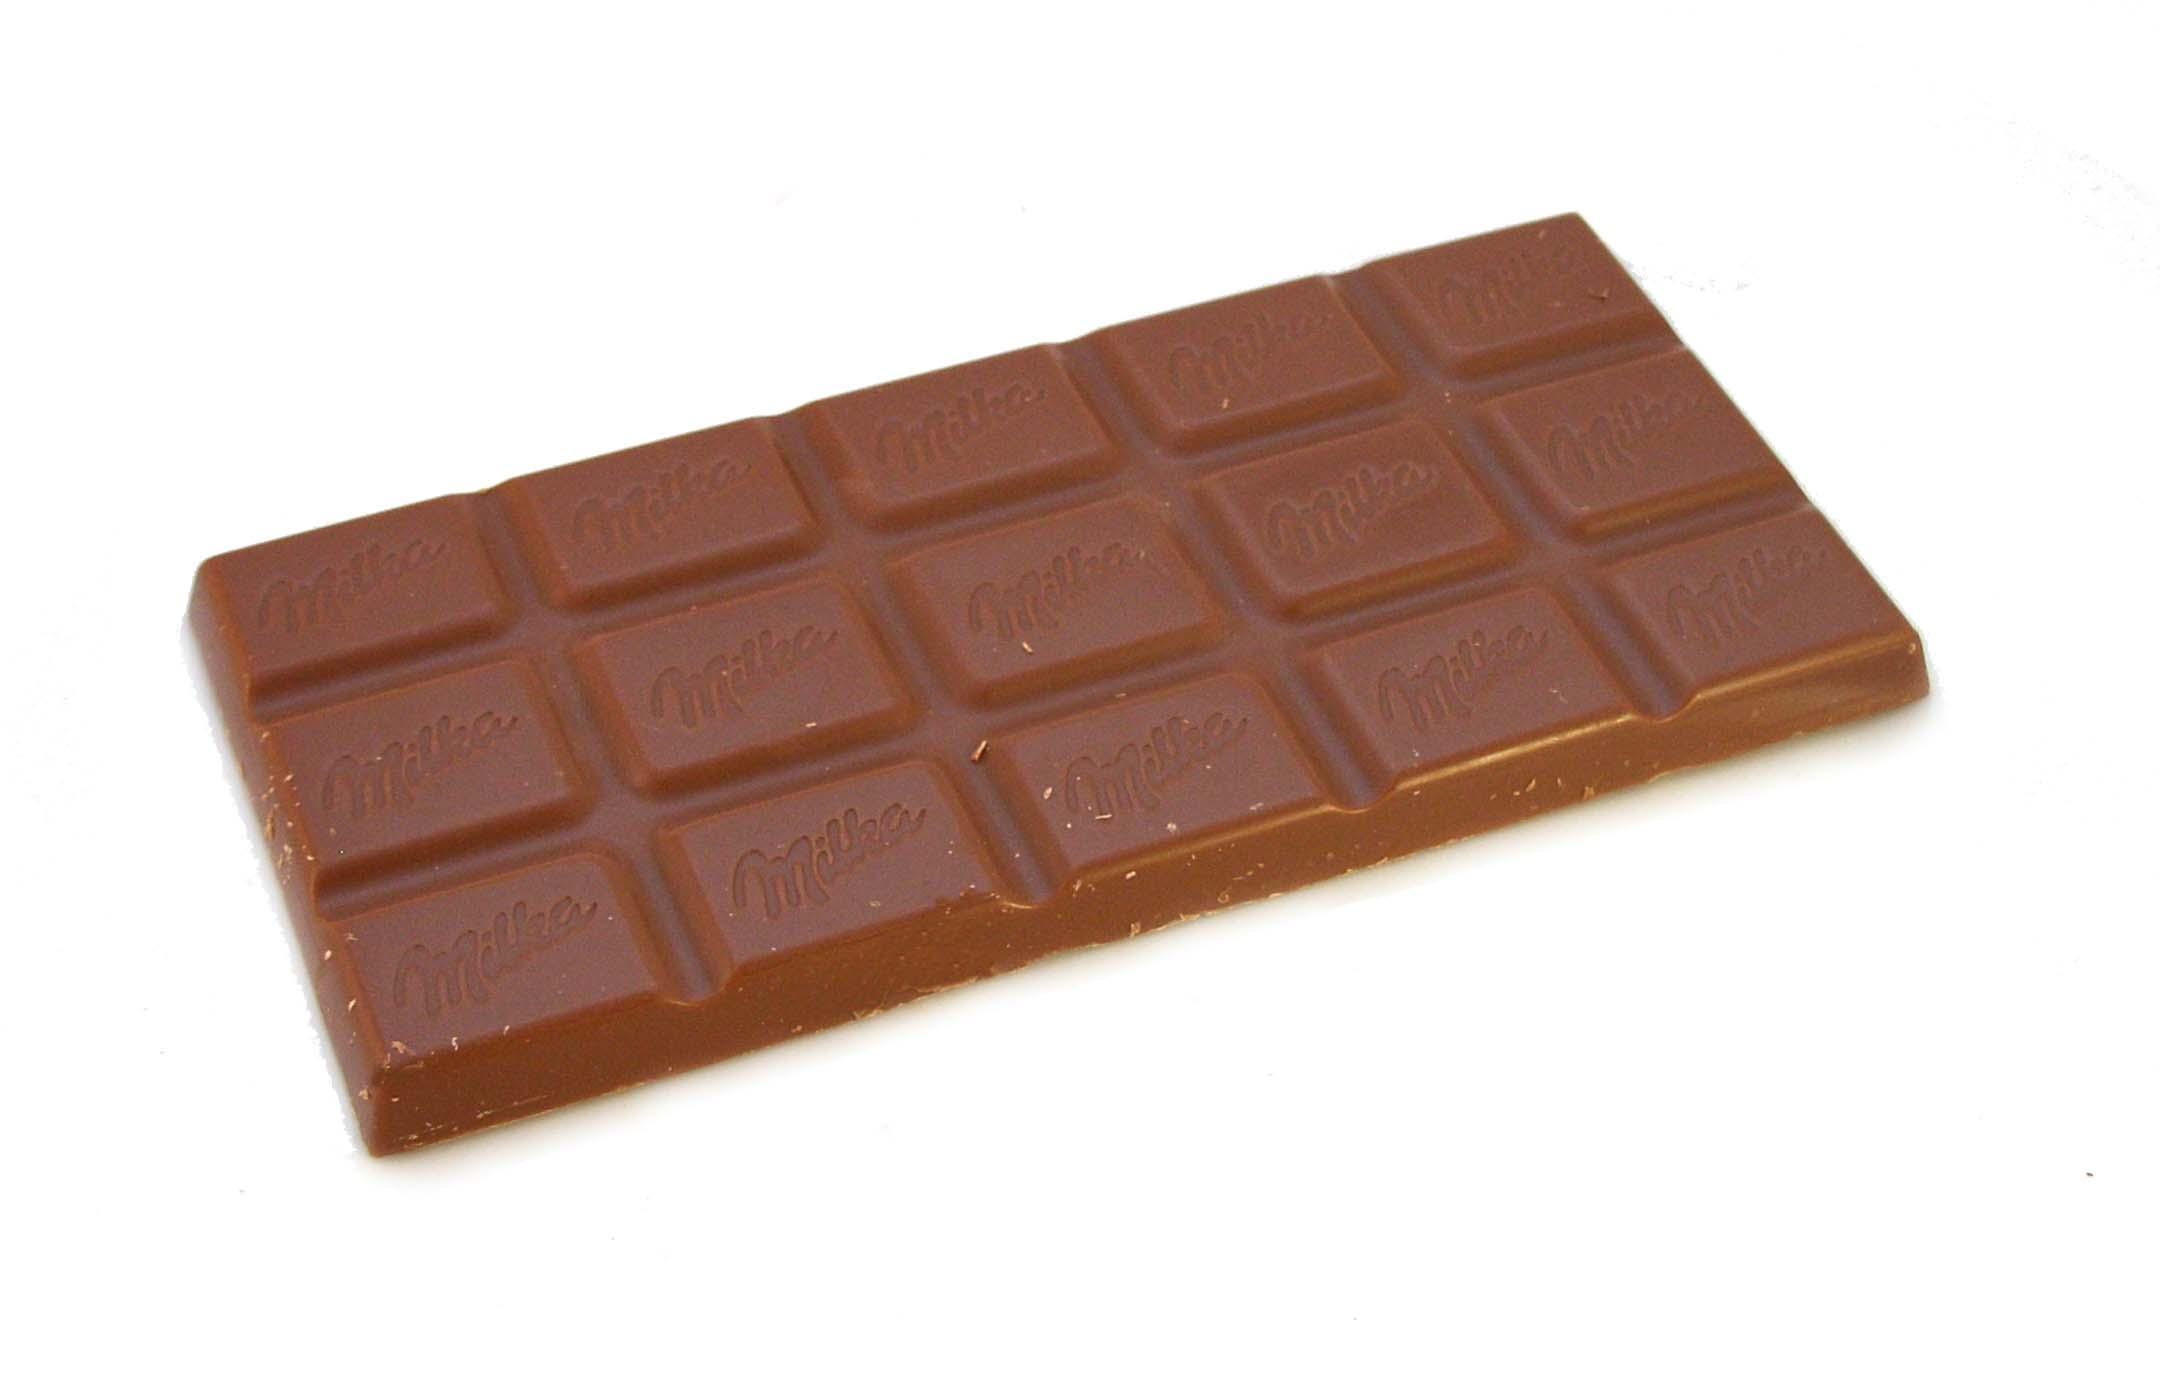 Sysprofile Schokolade Hardware Amp Reviews Seite 4